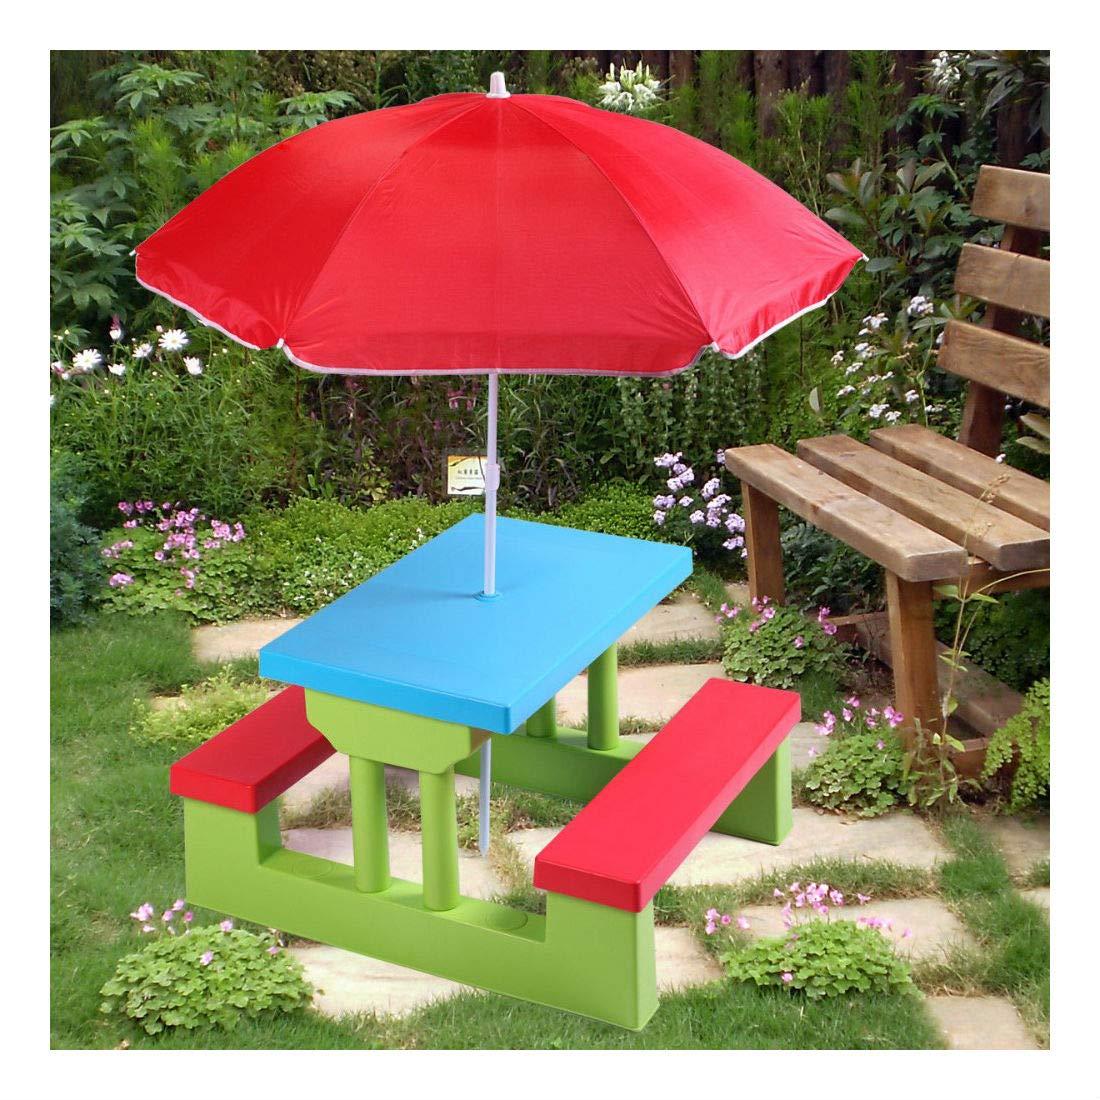 4 Seat Kids Picnic Table w/Umbrella Garden Yard Folding Bench Children Outdoor